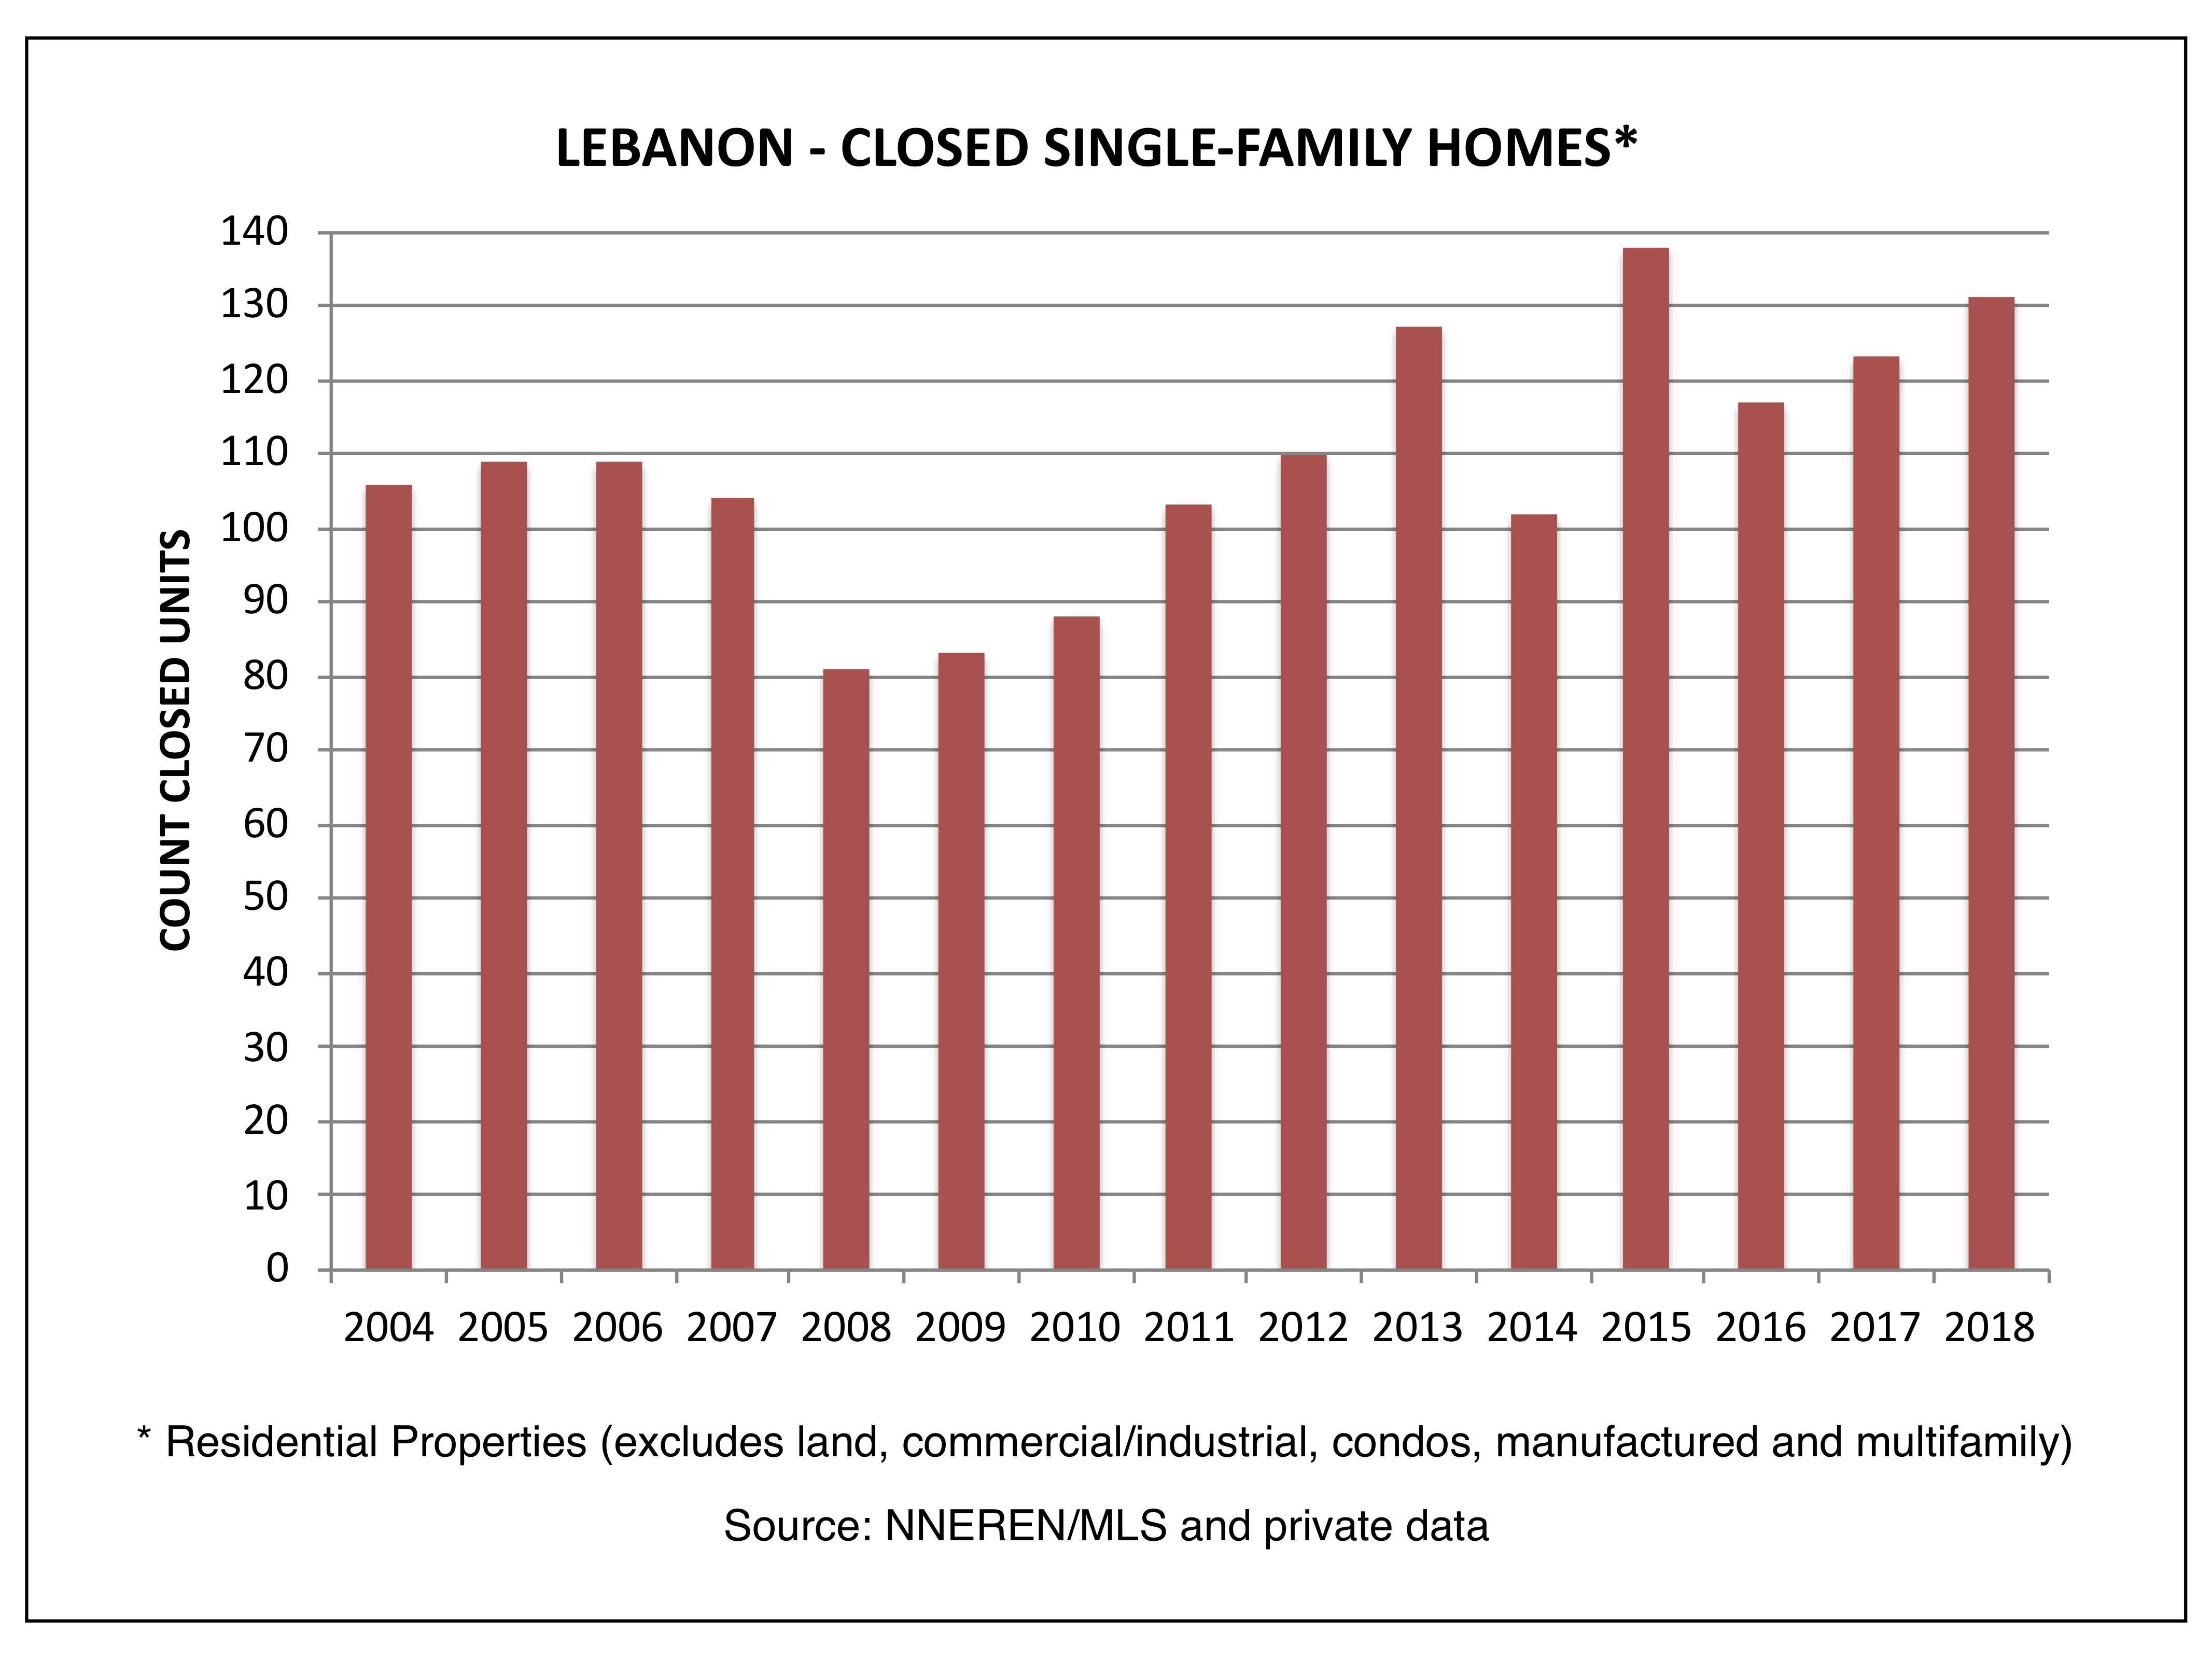 Lebanon NH Real Estate - Closed Single Family Homes